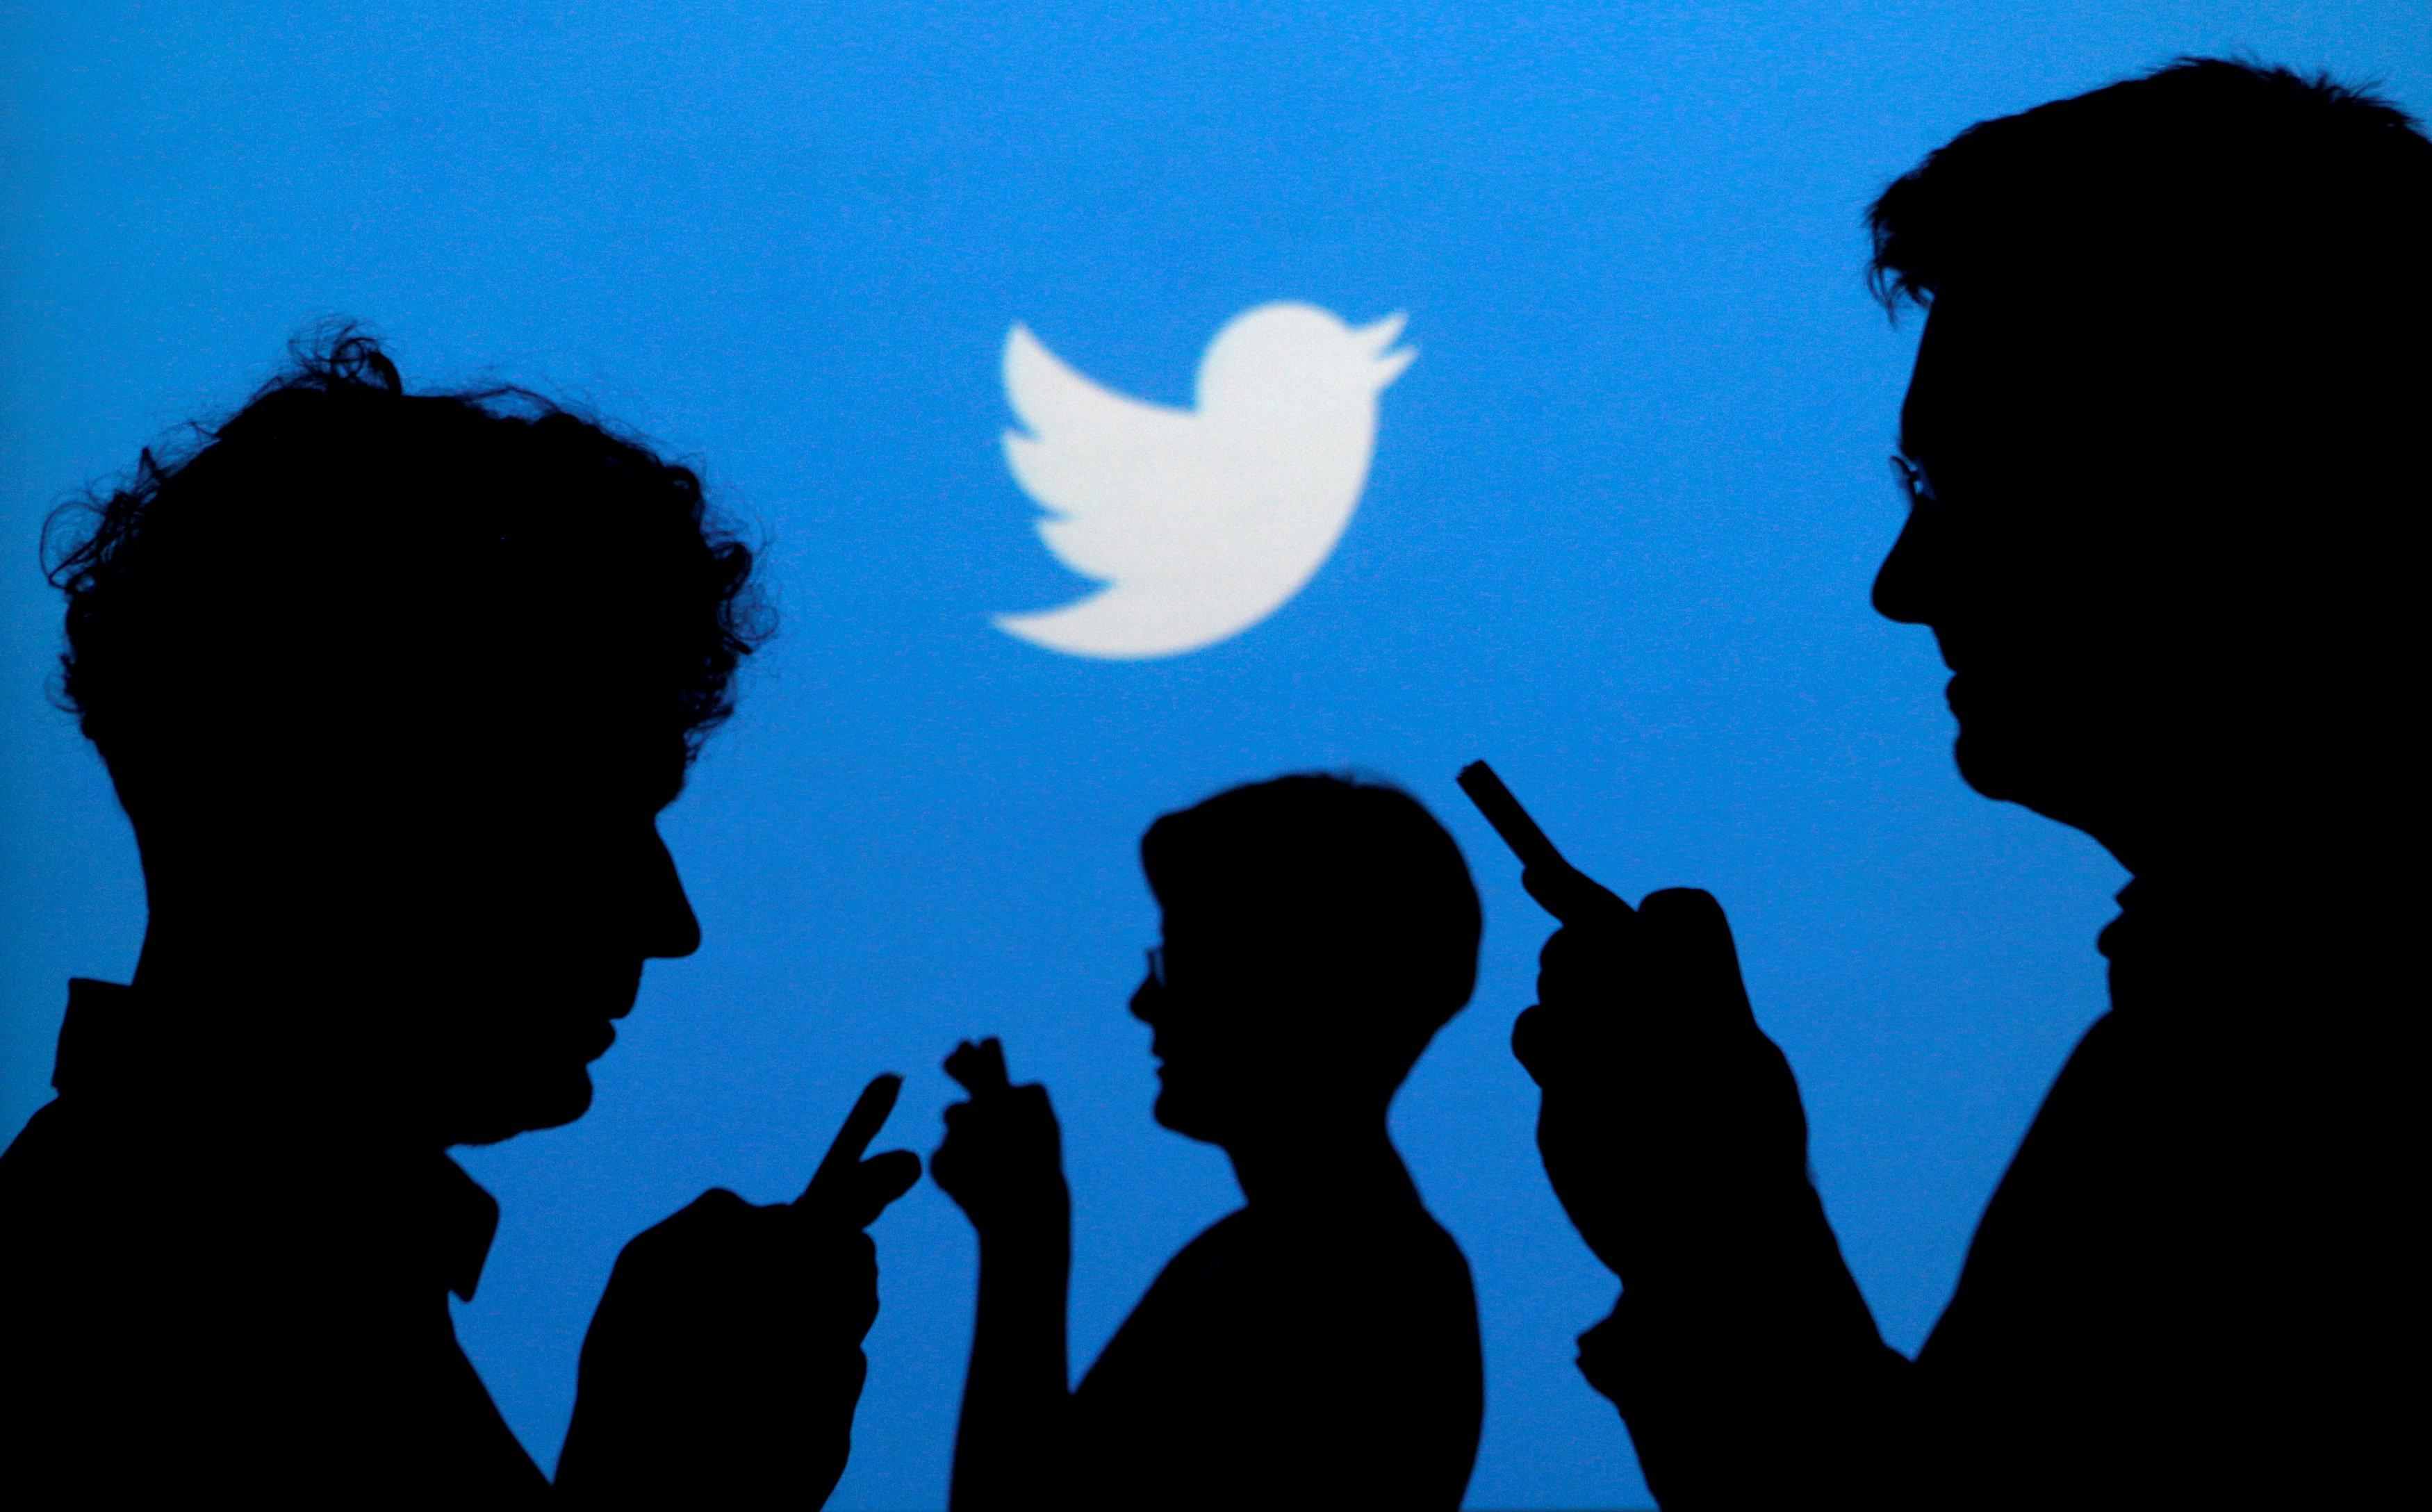 Реклама увеличила доходы Twitter в 2020 на31%